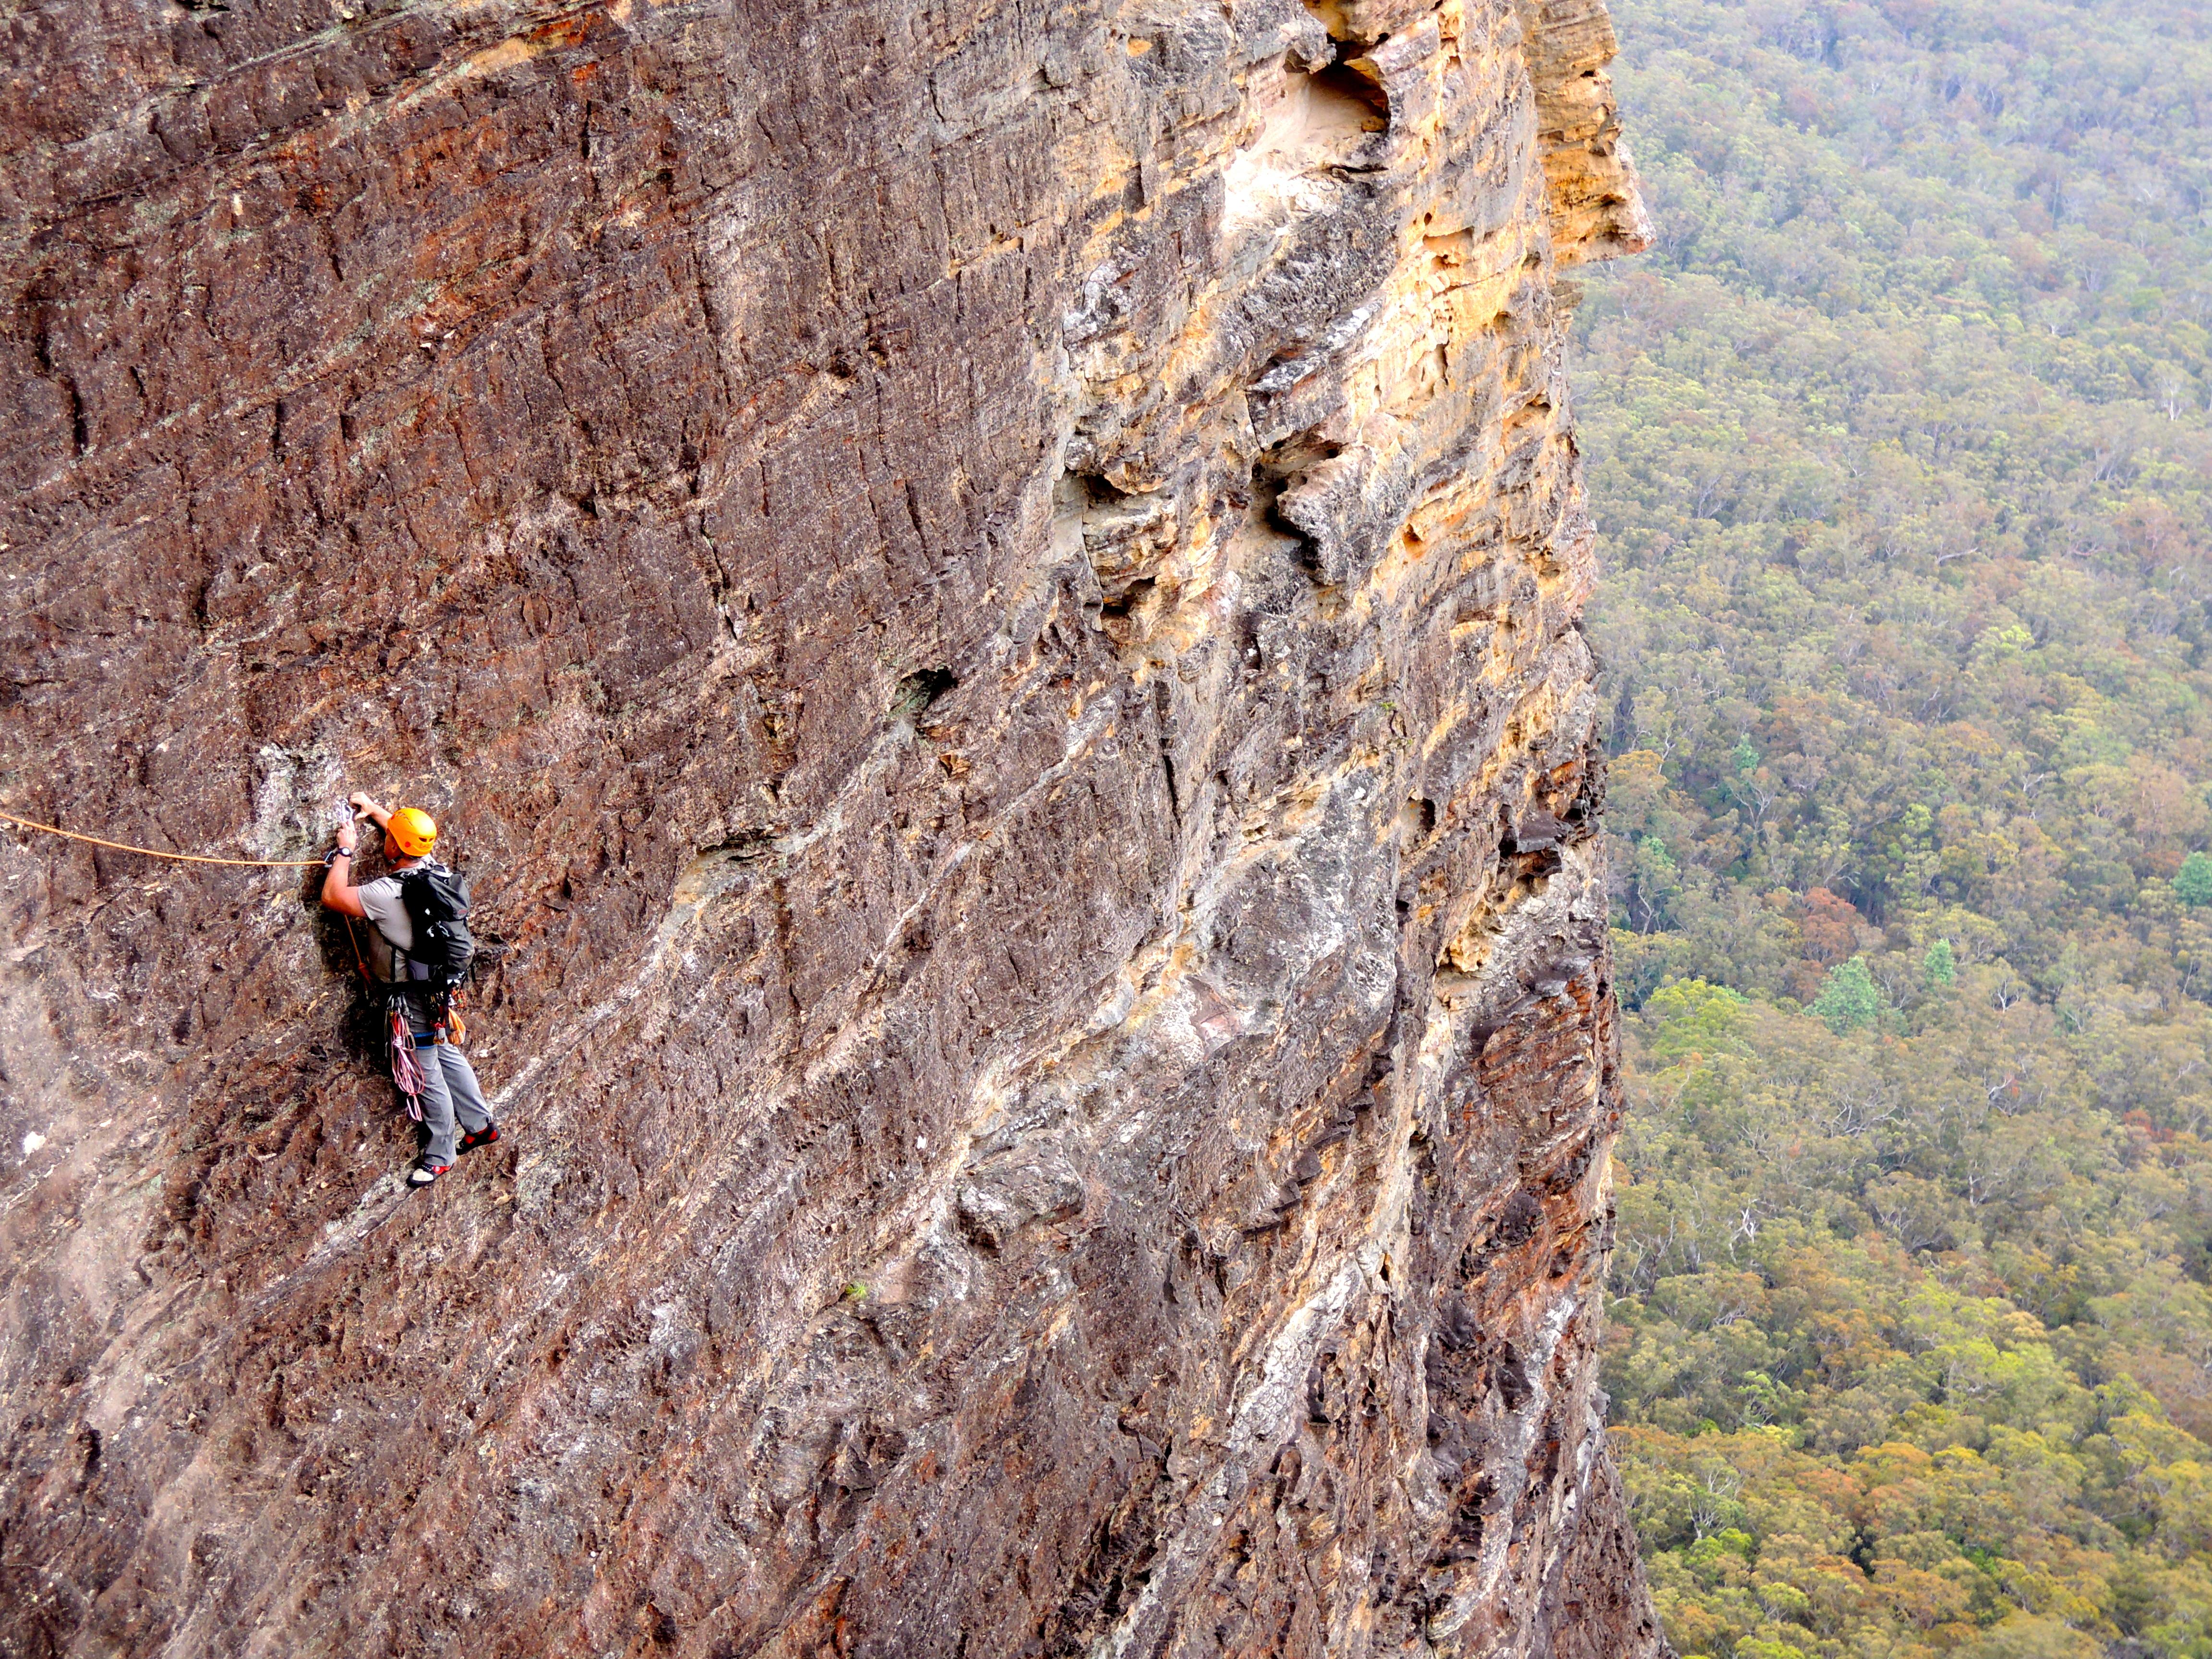 Baz - Climbing out Boar's Head, Blue Mountains, Australia